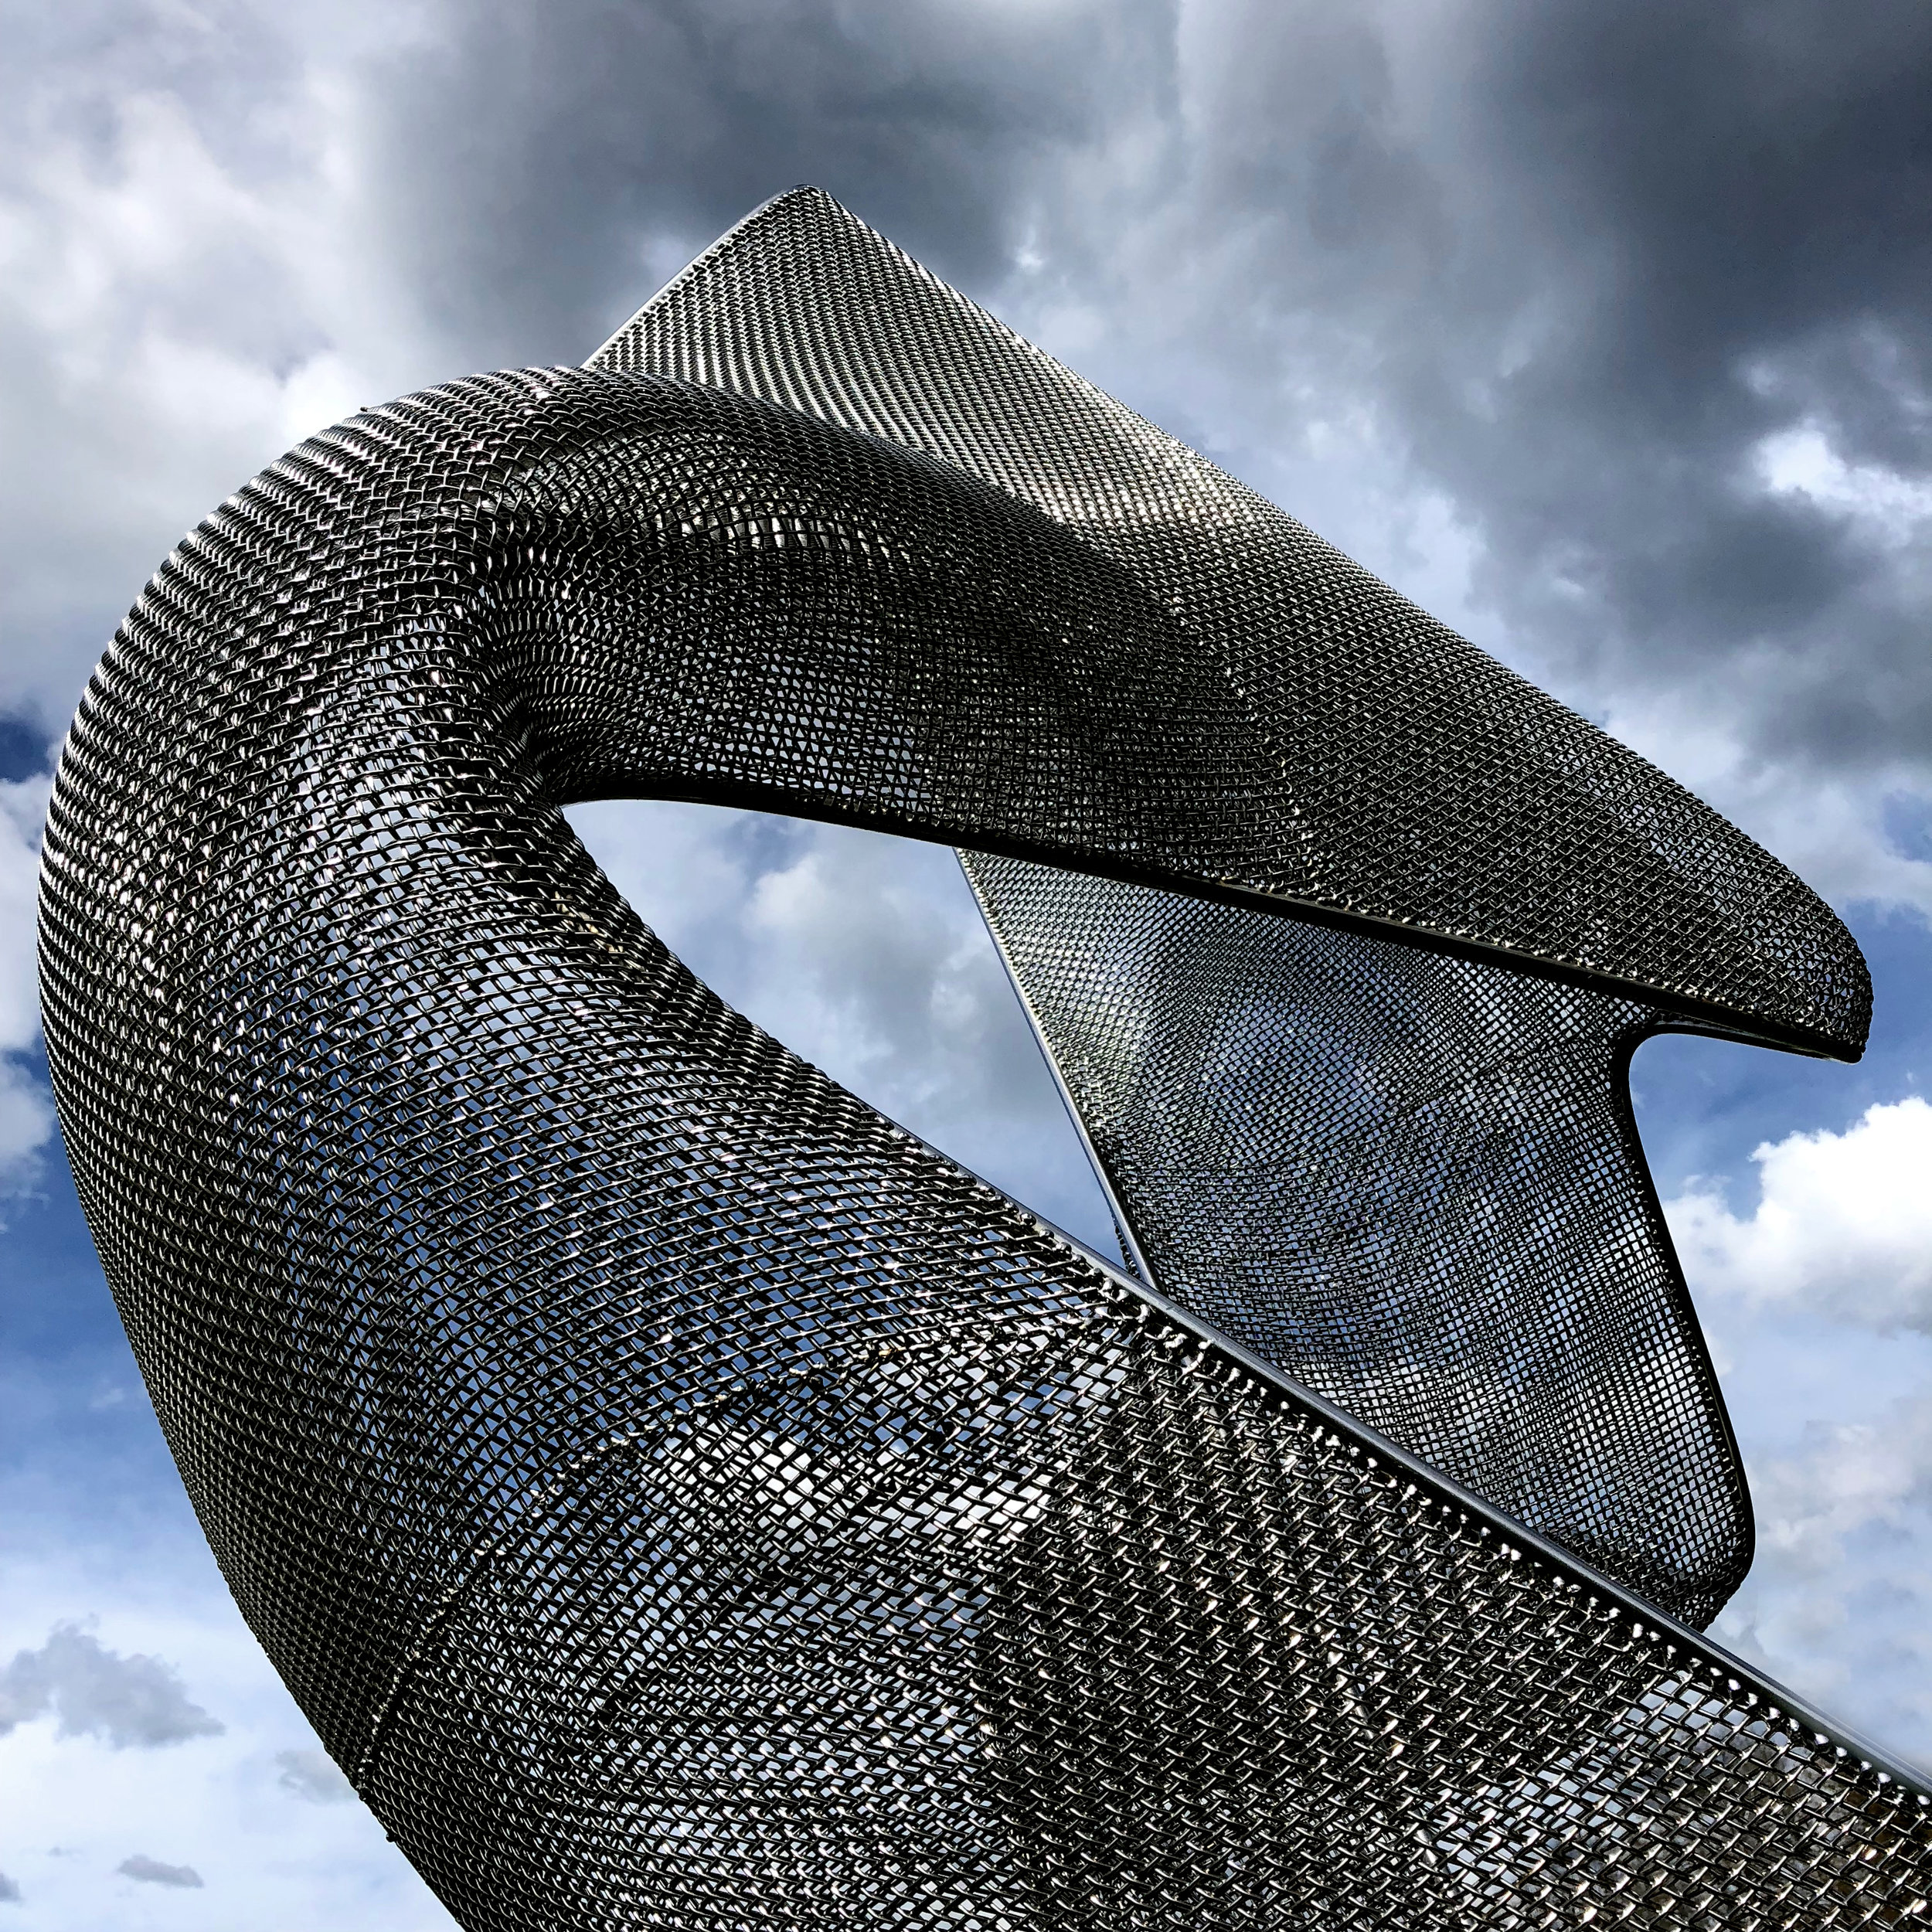 Sculptor Erich Hauser's gigantic metal creations in Rottweil.